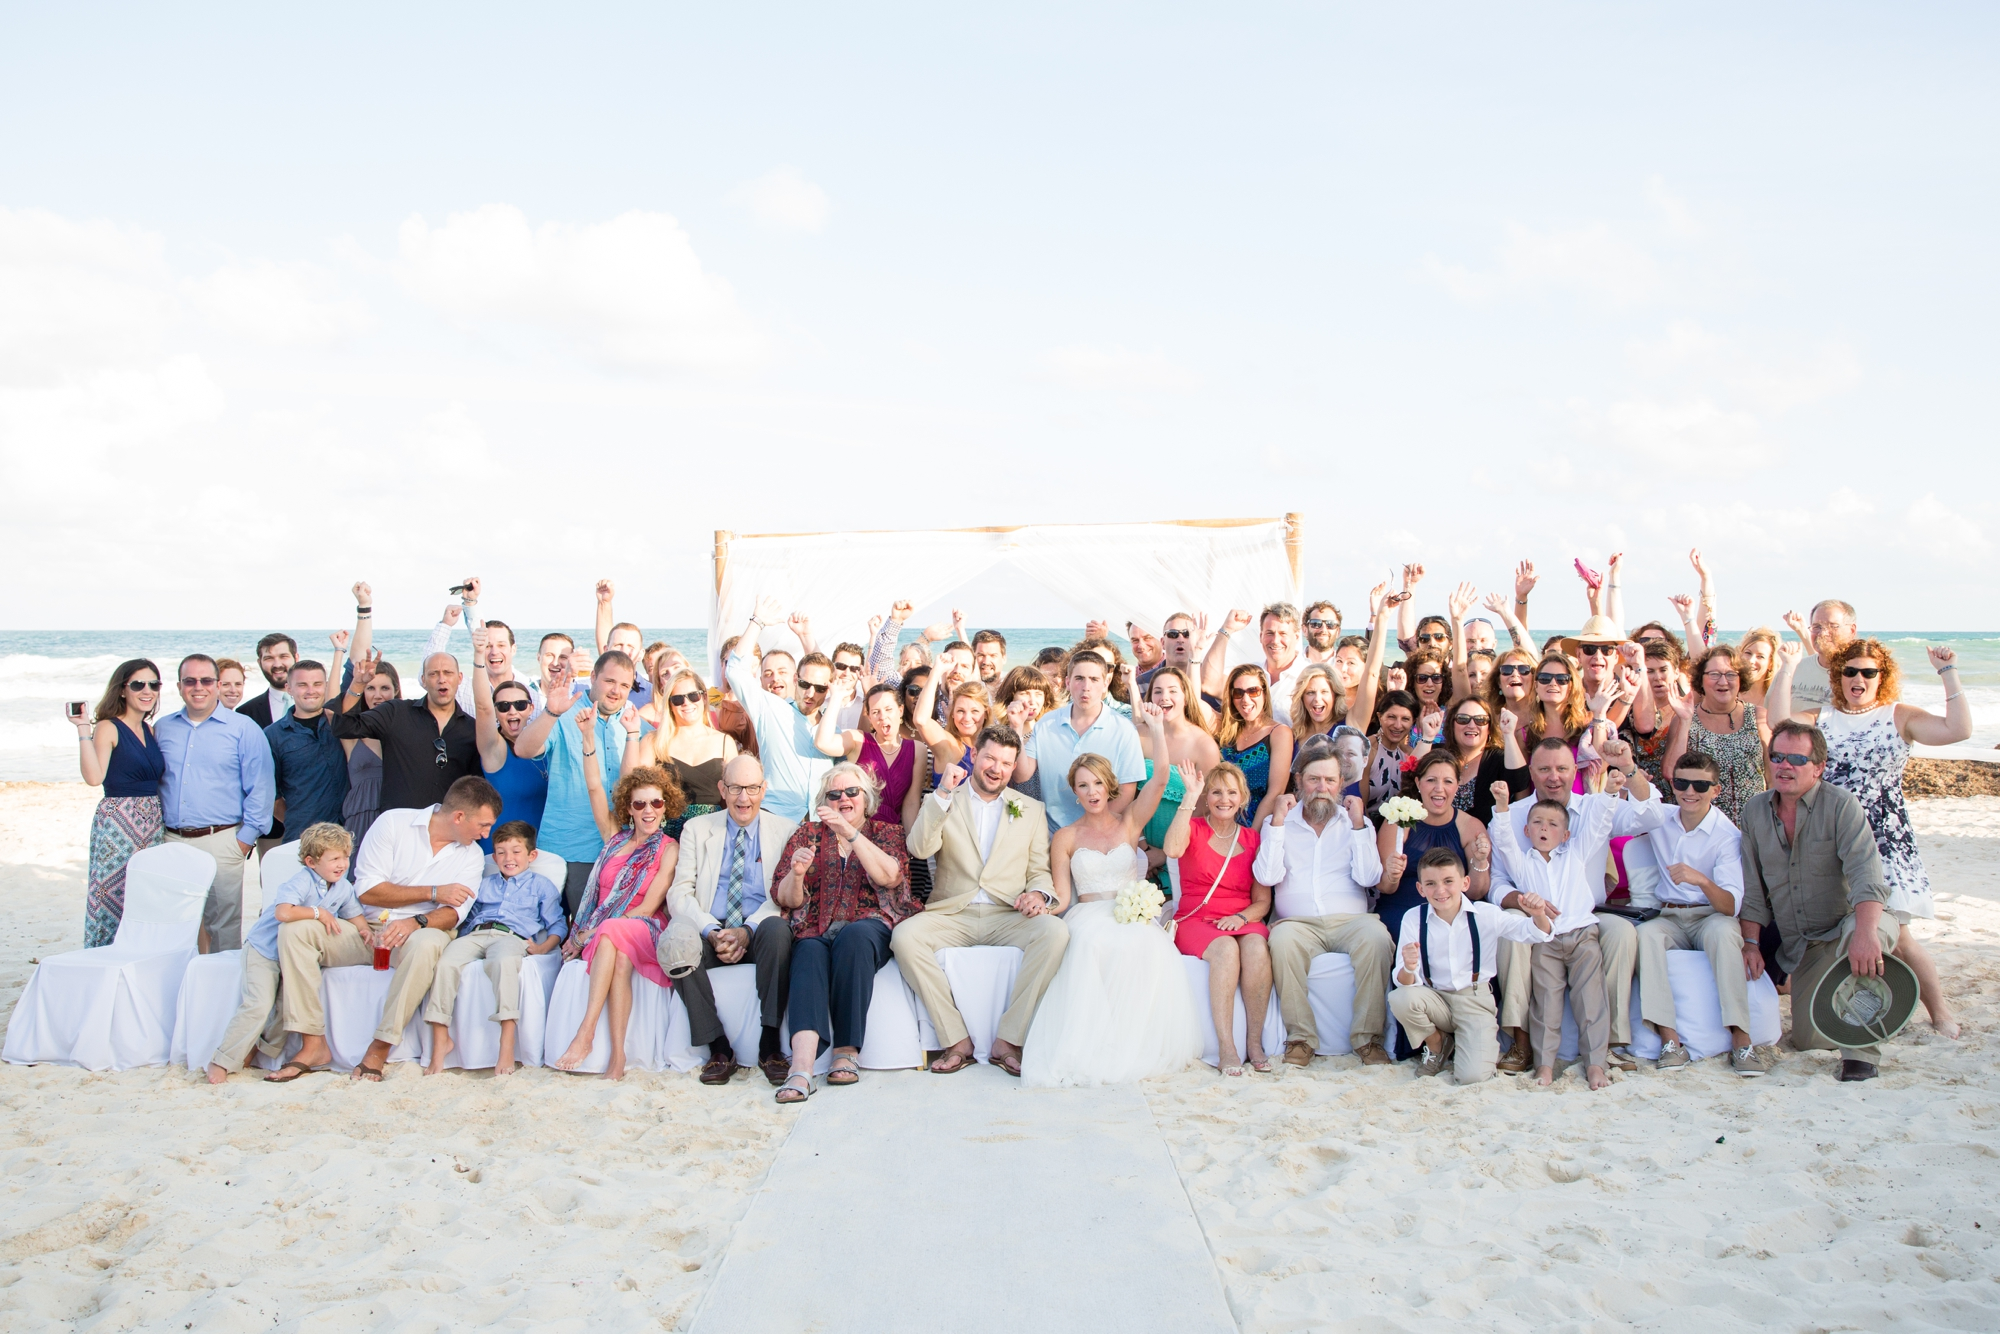 Morosoff Wedding 3-Family Formals-237_anna grace photography destination wedding photographer playa del carmen mexico photo.jpg